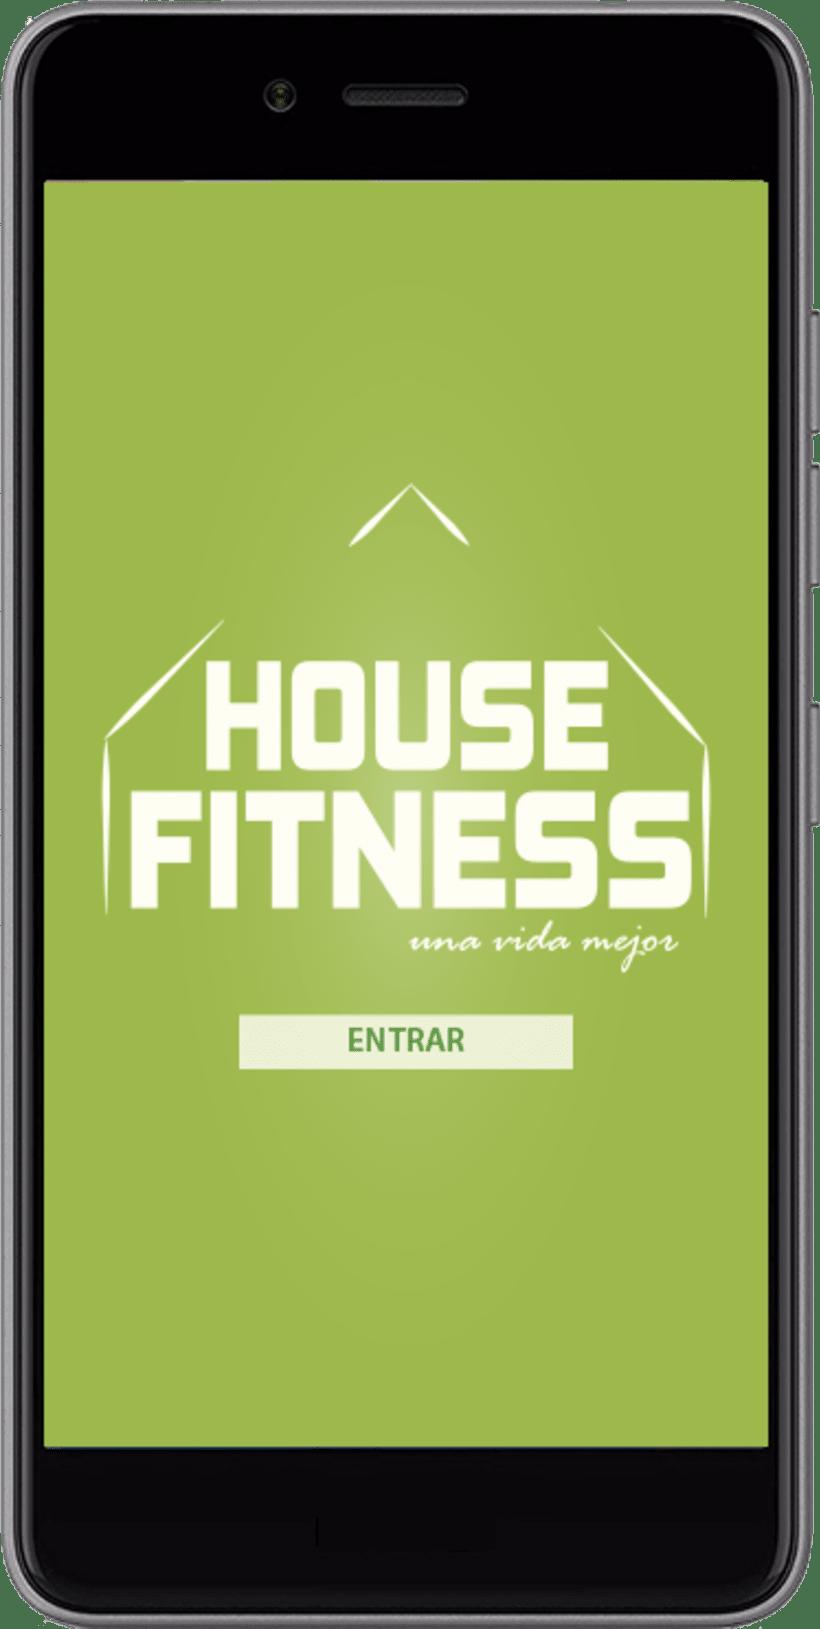 Desarollo de App House Fitness 0